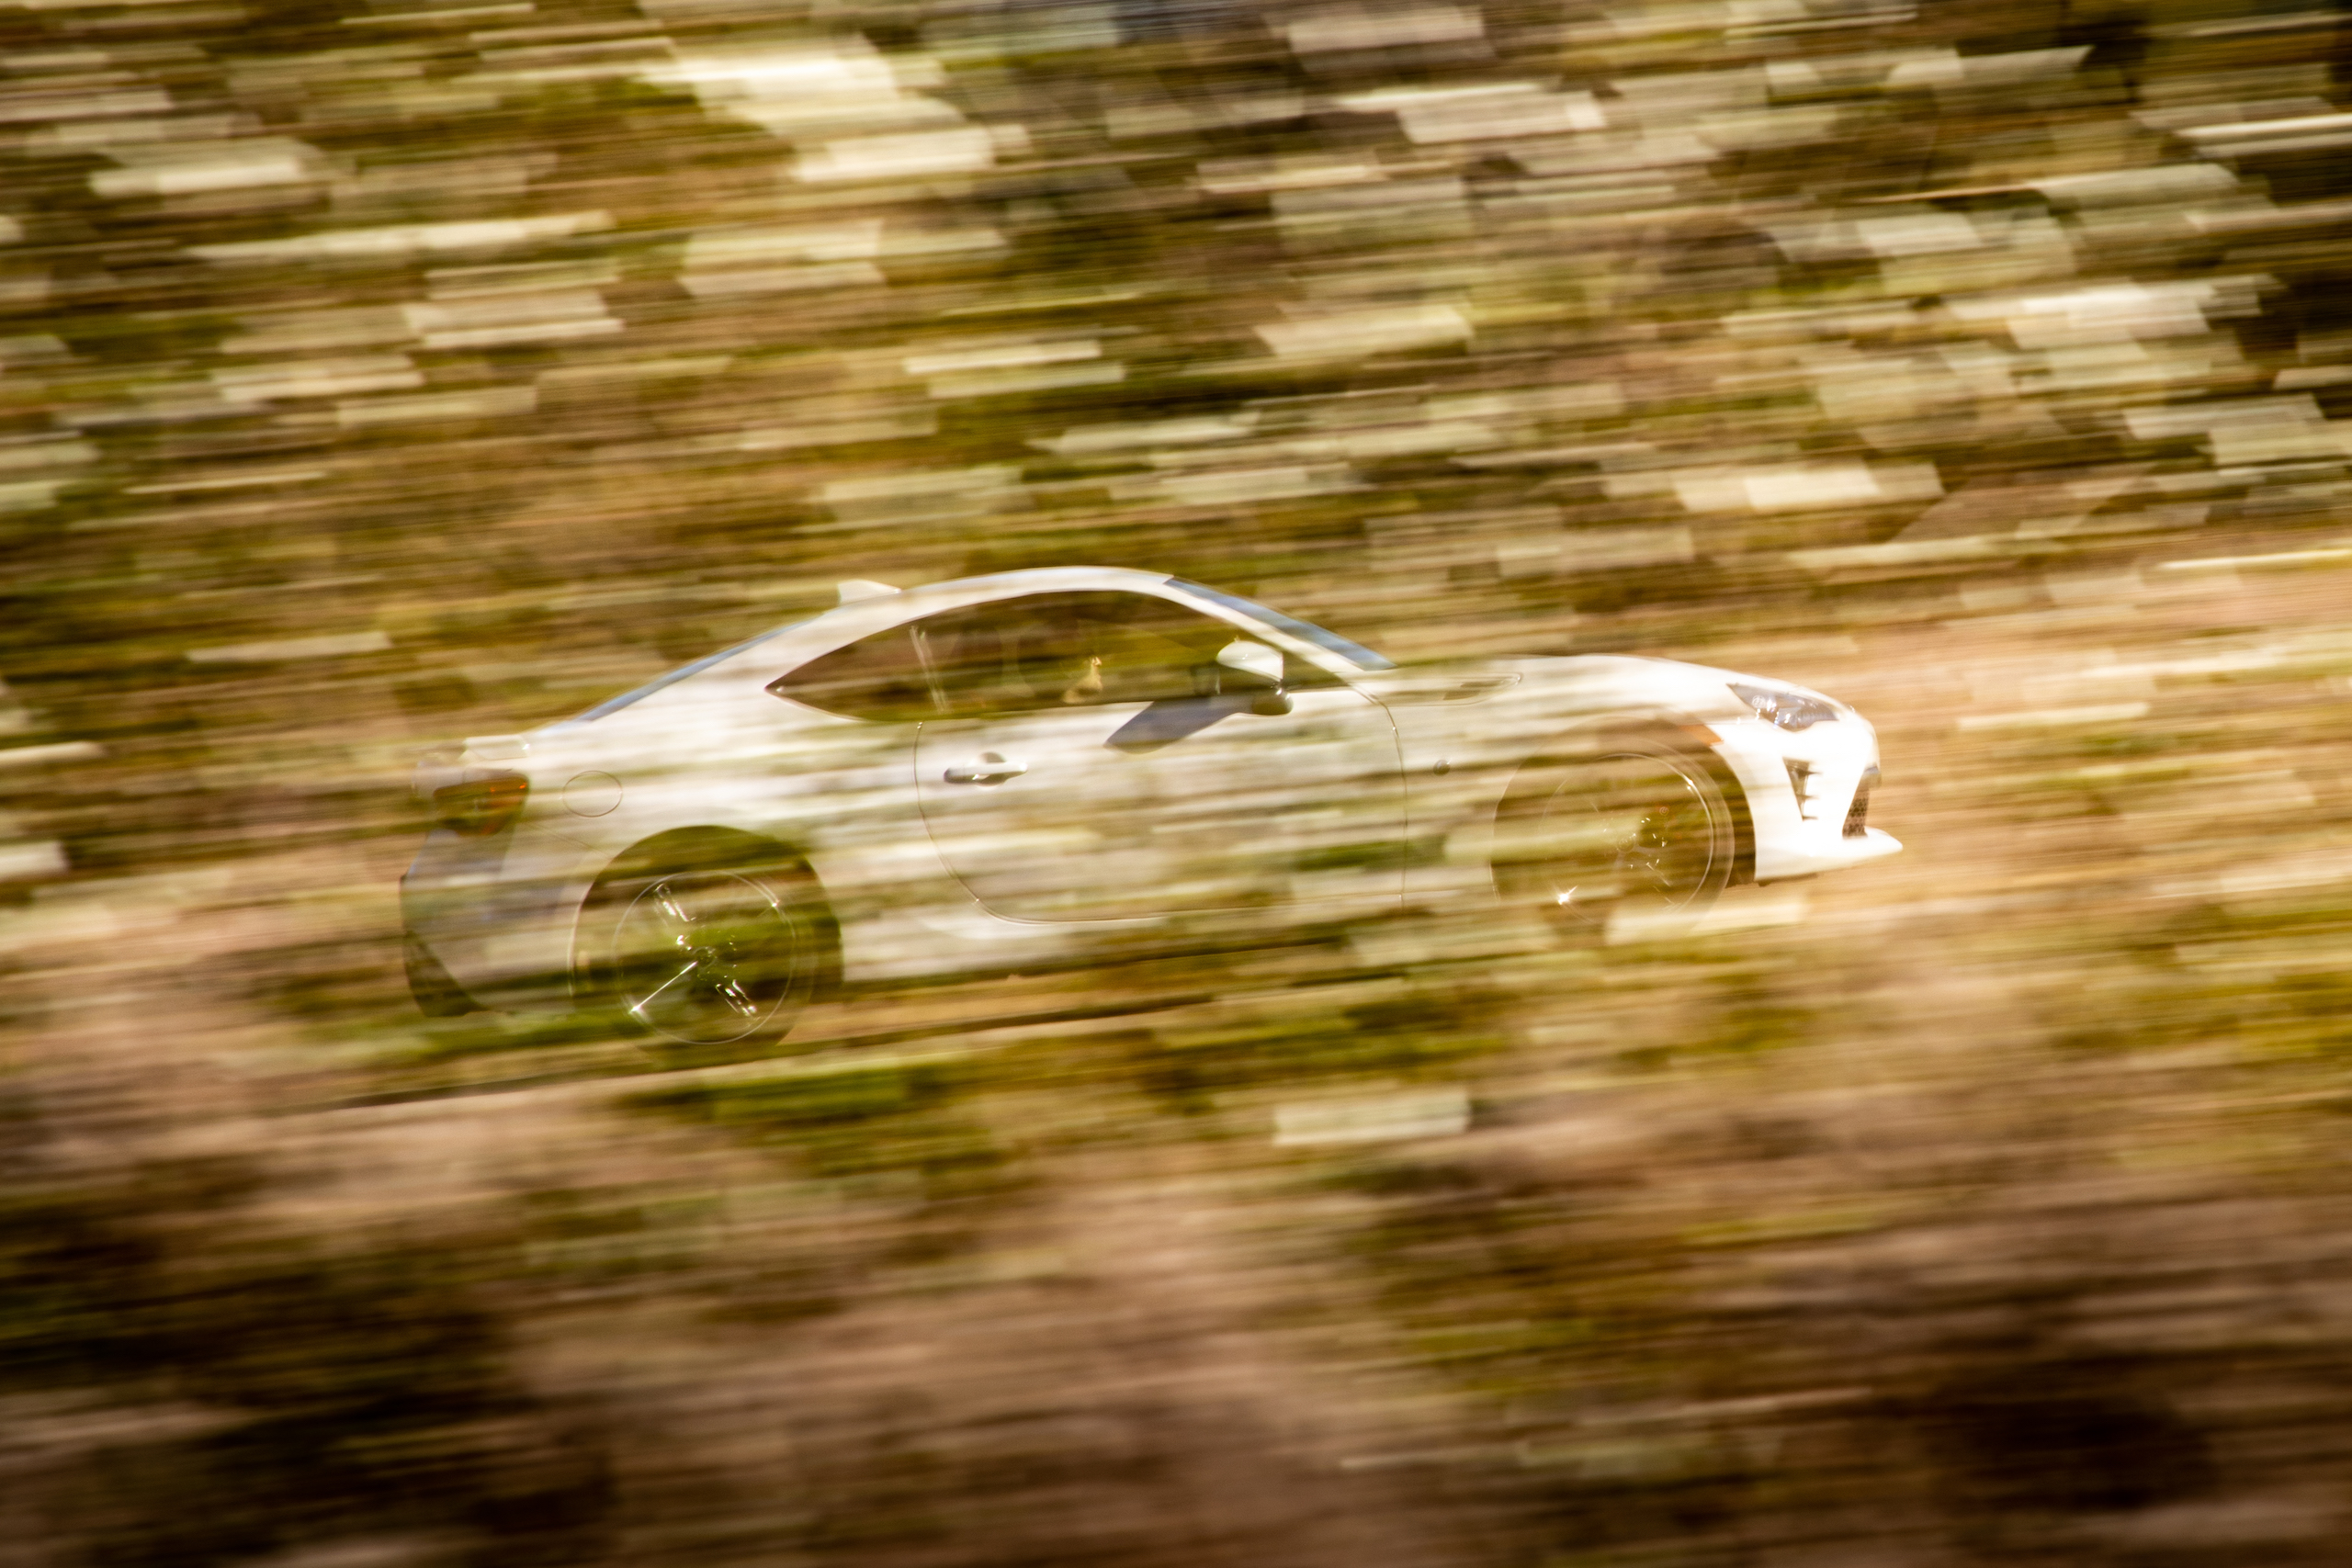 2020 Toyota 86 GT side profile dynamic action through foliage